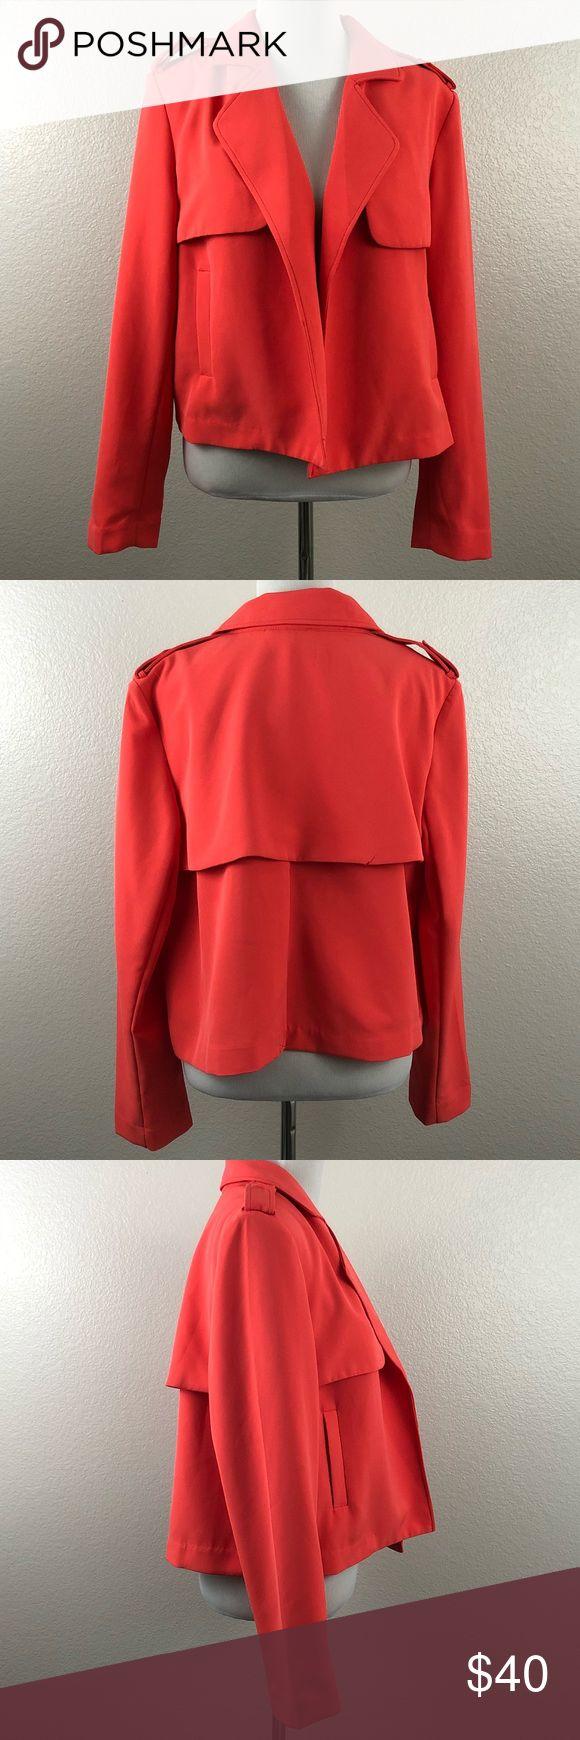 "Lane Bryant Women's EUC Open Peach Blazer size 14 Lane Bryant Women's EUC Open Front Peach Blazer size 14  False Front Pockets.  Length (Shoulder to Hem) - 22""  Armpit to Armpit - 20"" Lane Bryant Jackets & Coats Blazers"